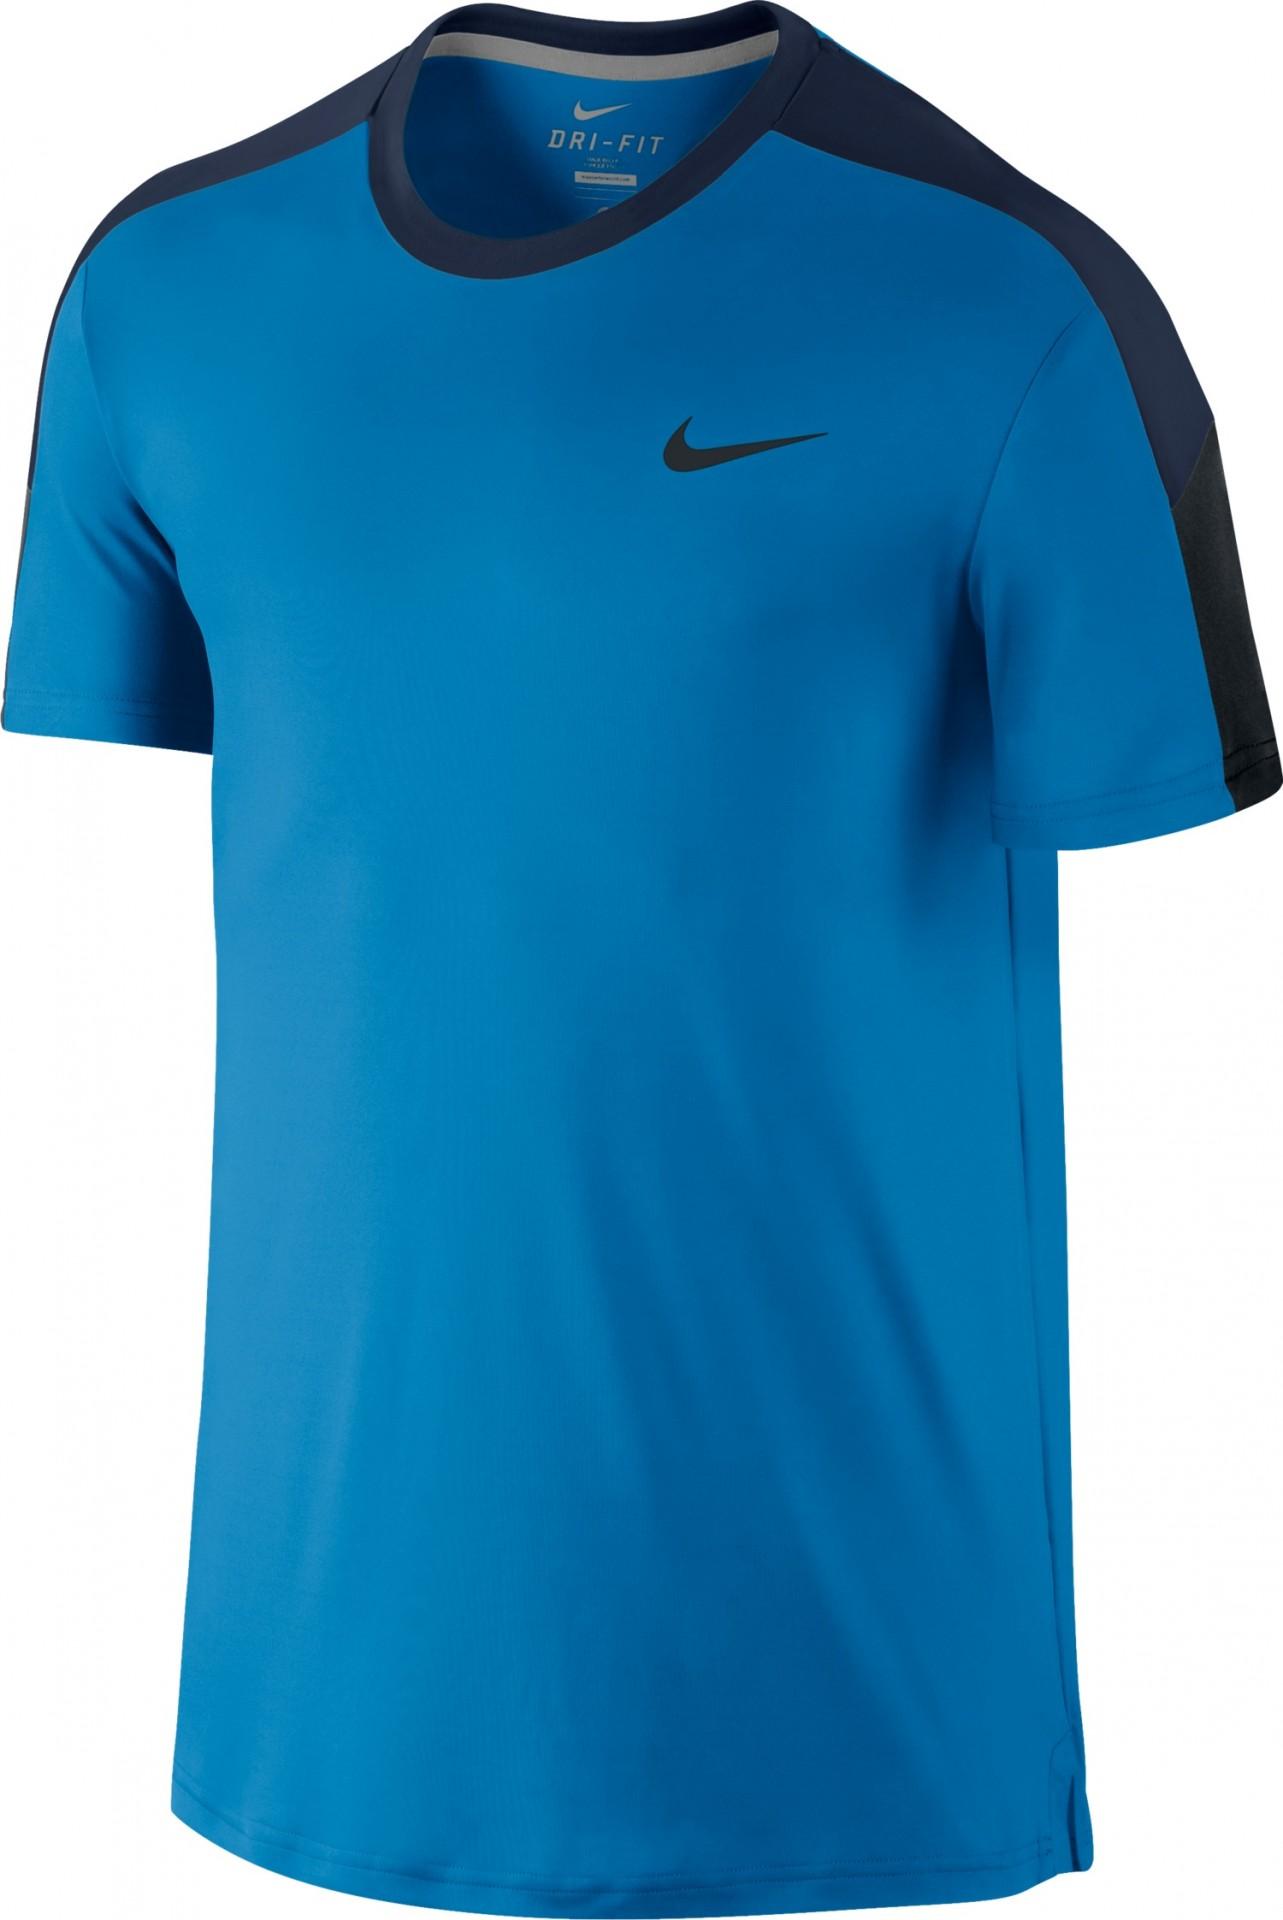 091046123ff0 Tenisové tričko Nike Team Crew Court 644784-435 modré